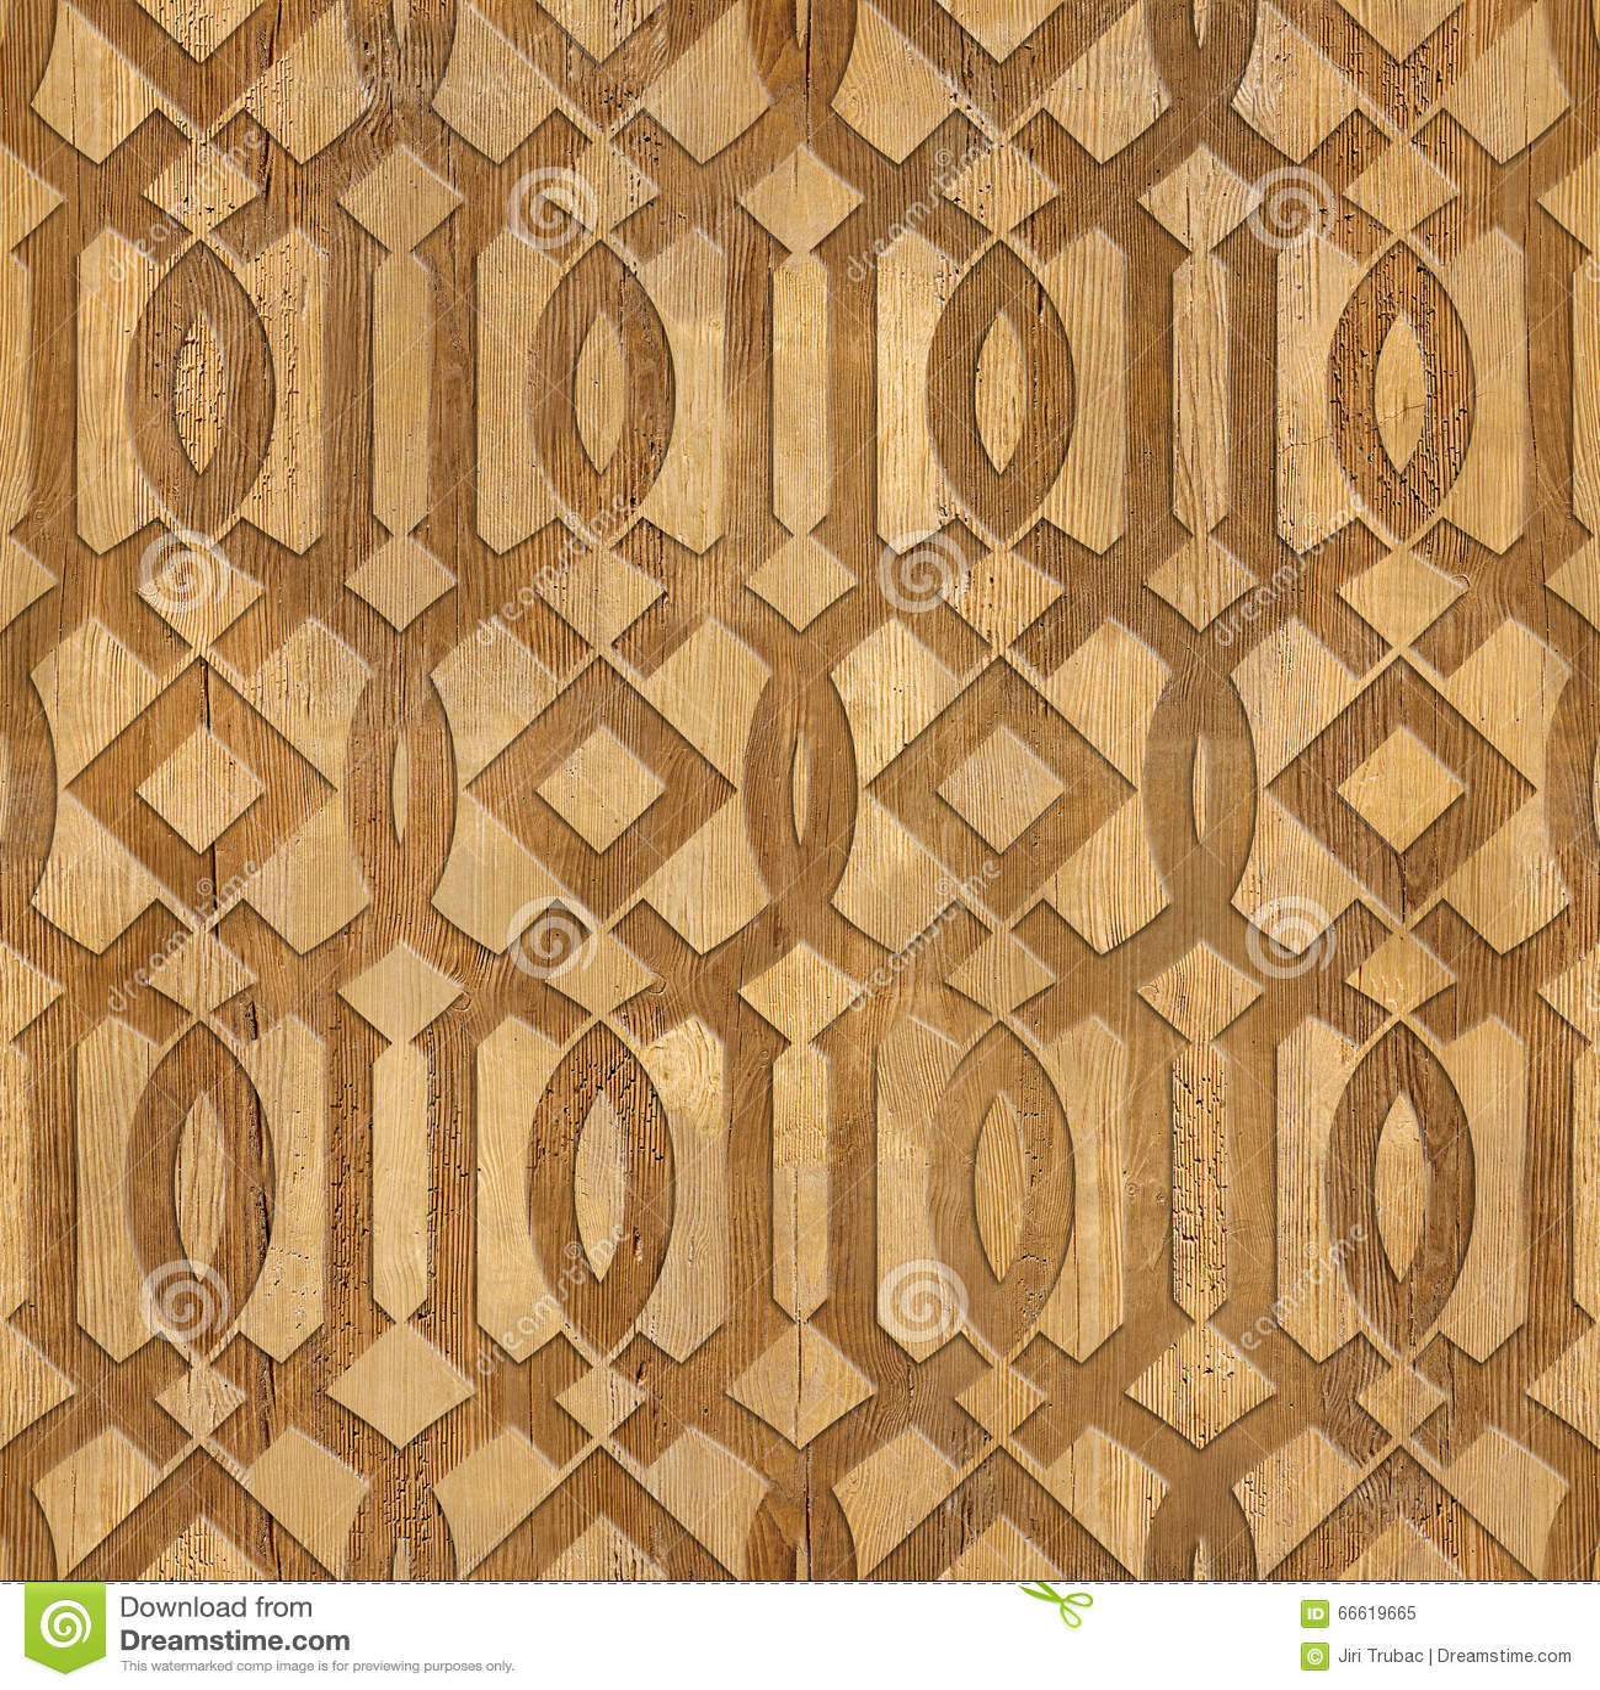 Decorative arabic pattern interior design wallpaper Design patterns wall painting